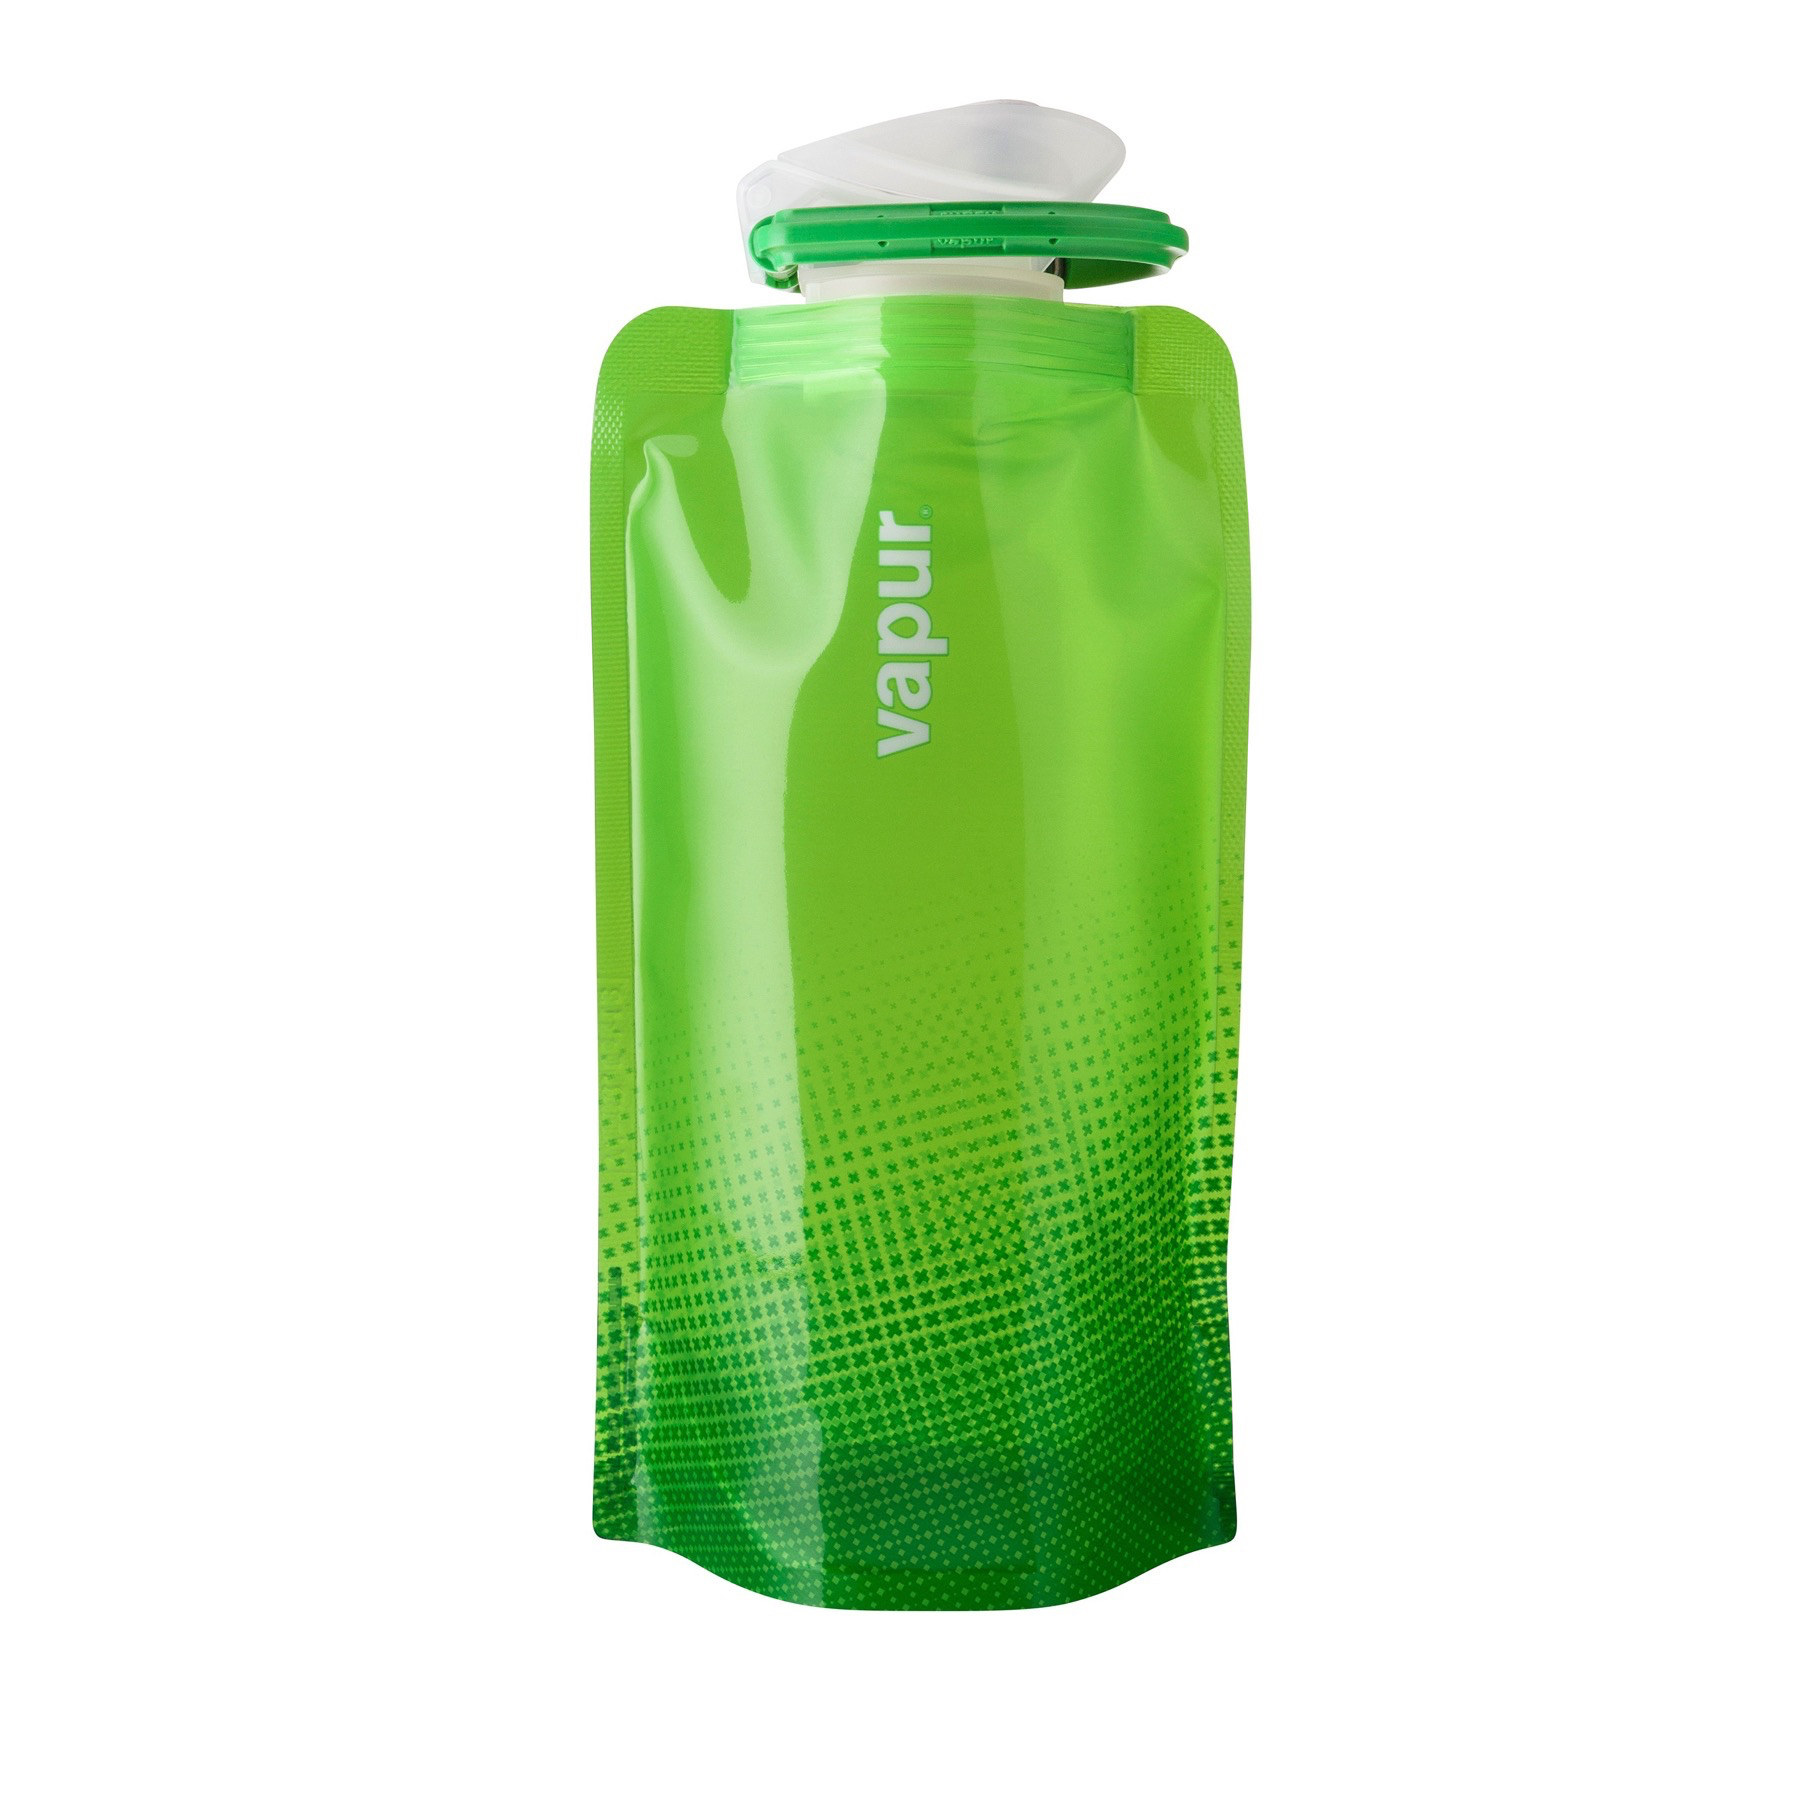 0.5 Litres Grey Vapur Shades Reusable Plastic Water Bottle